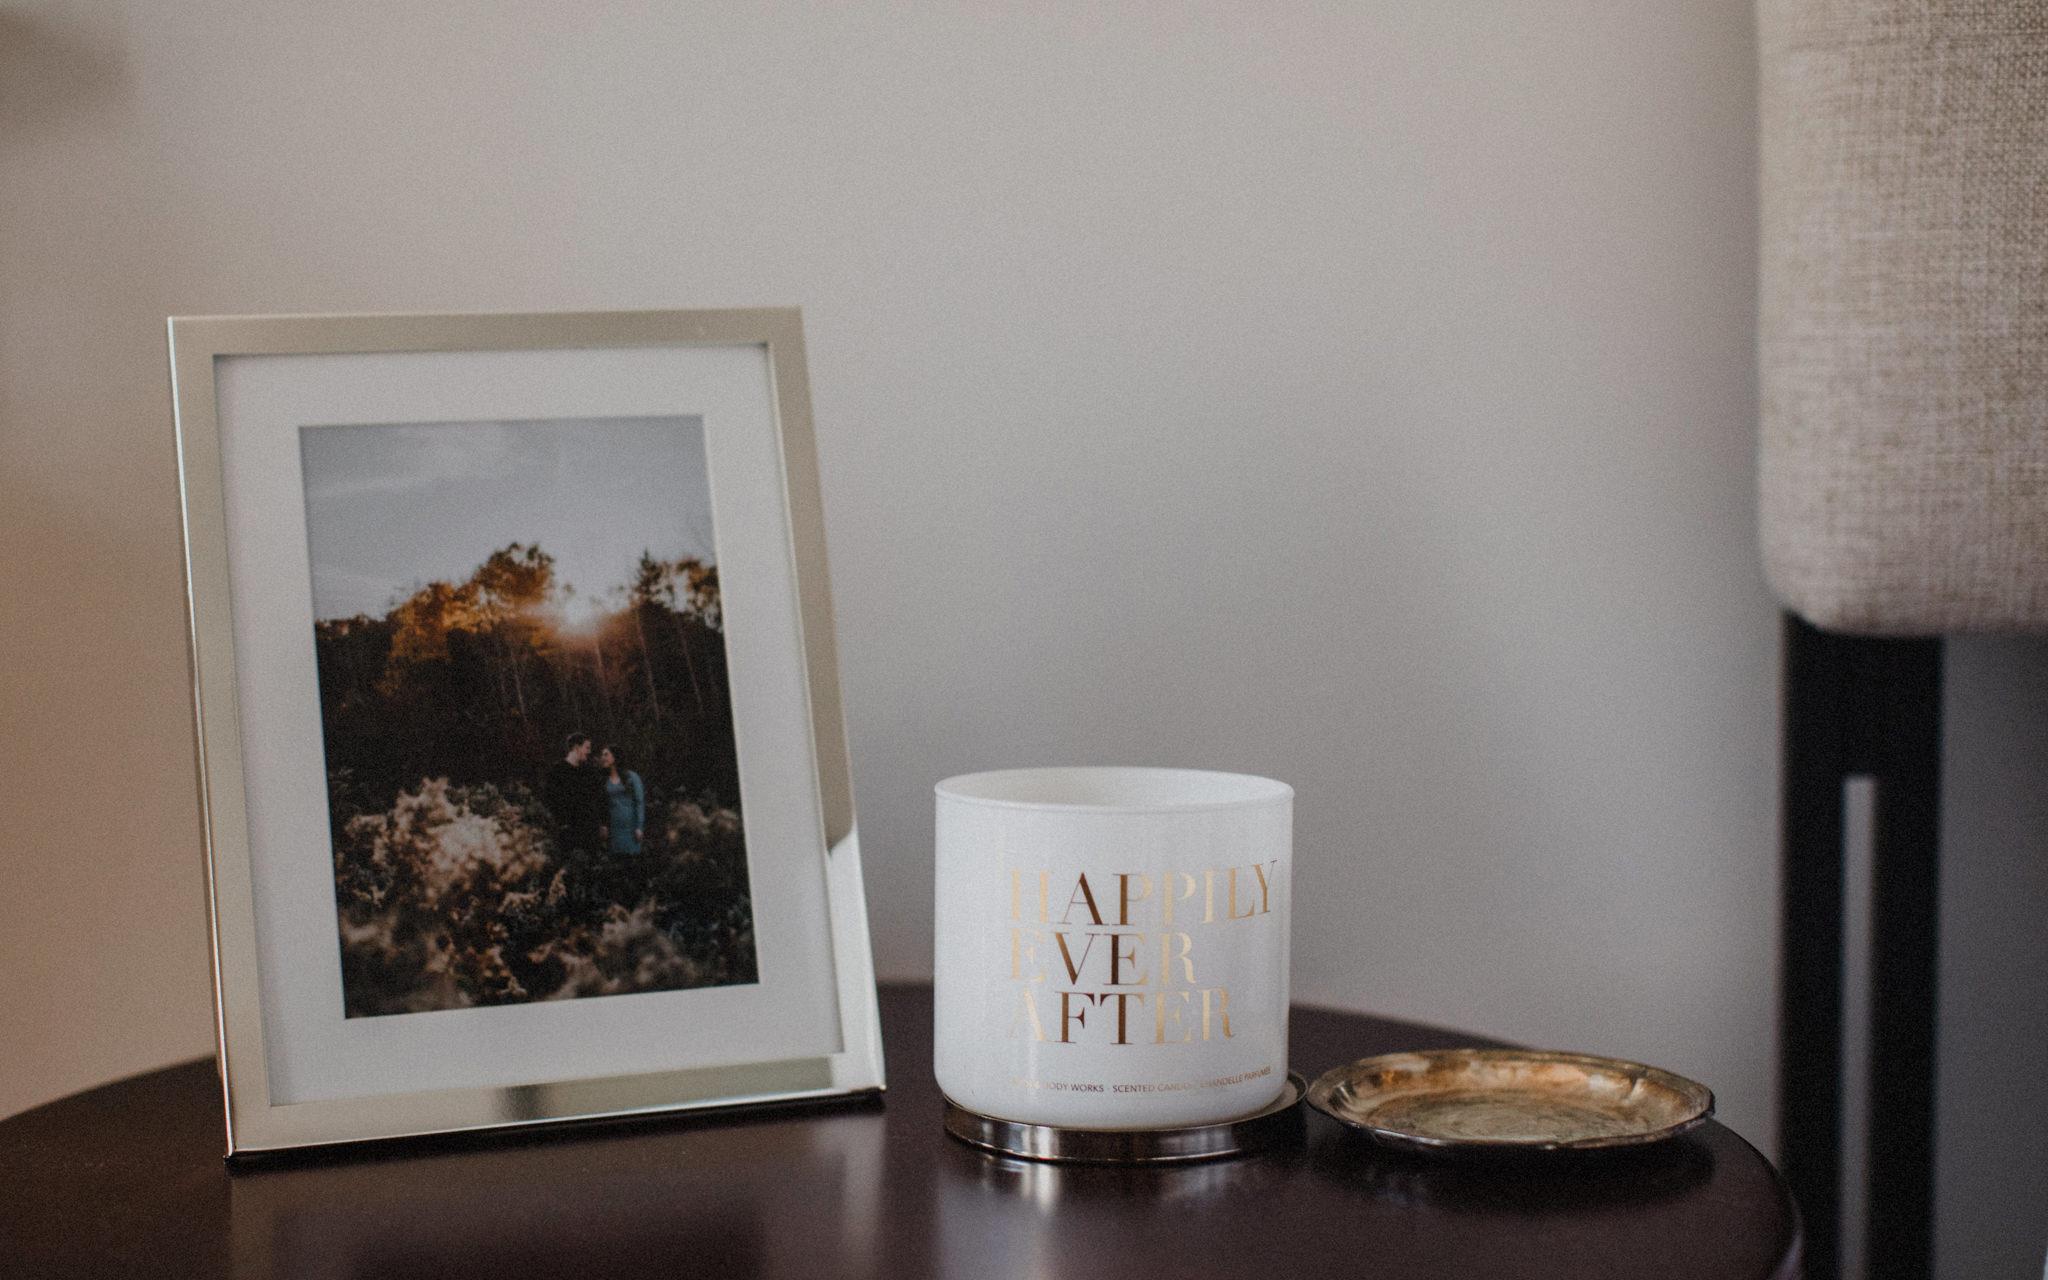 engagement photo framed beside bed